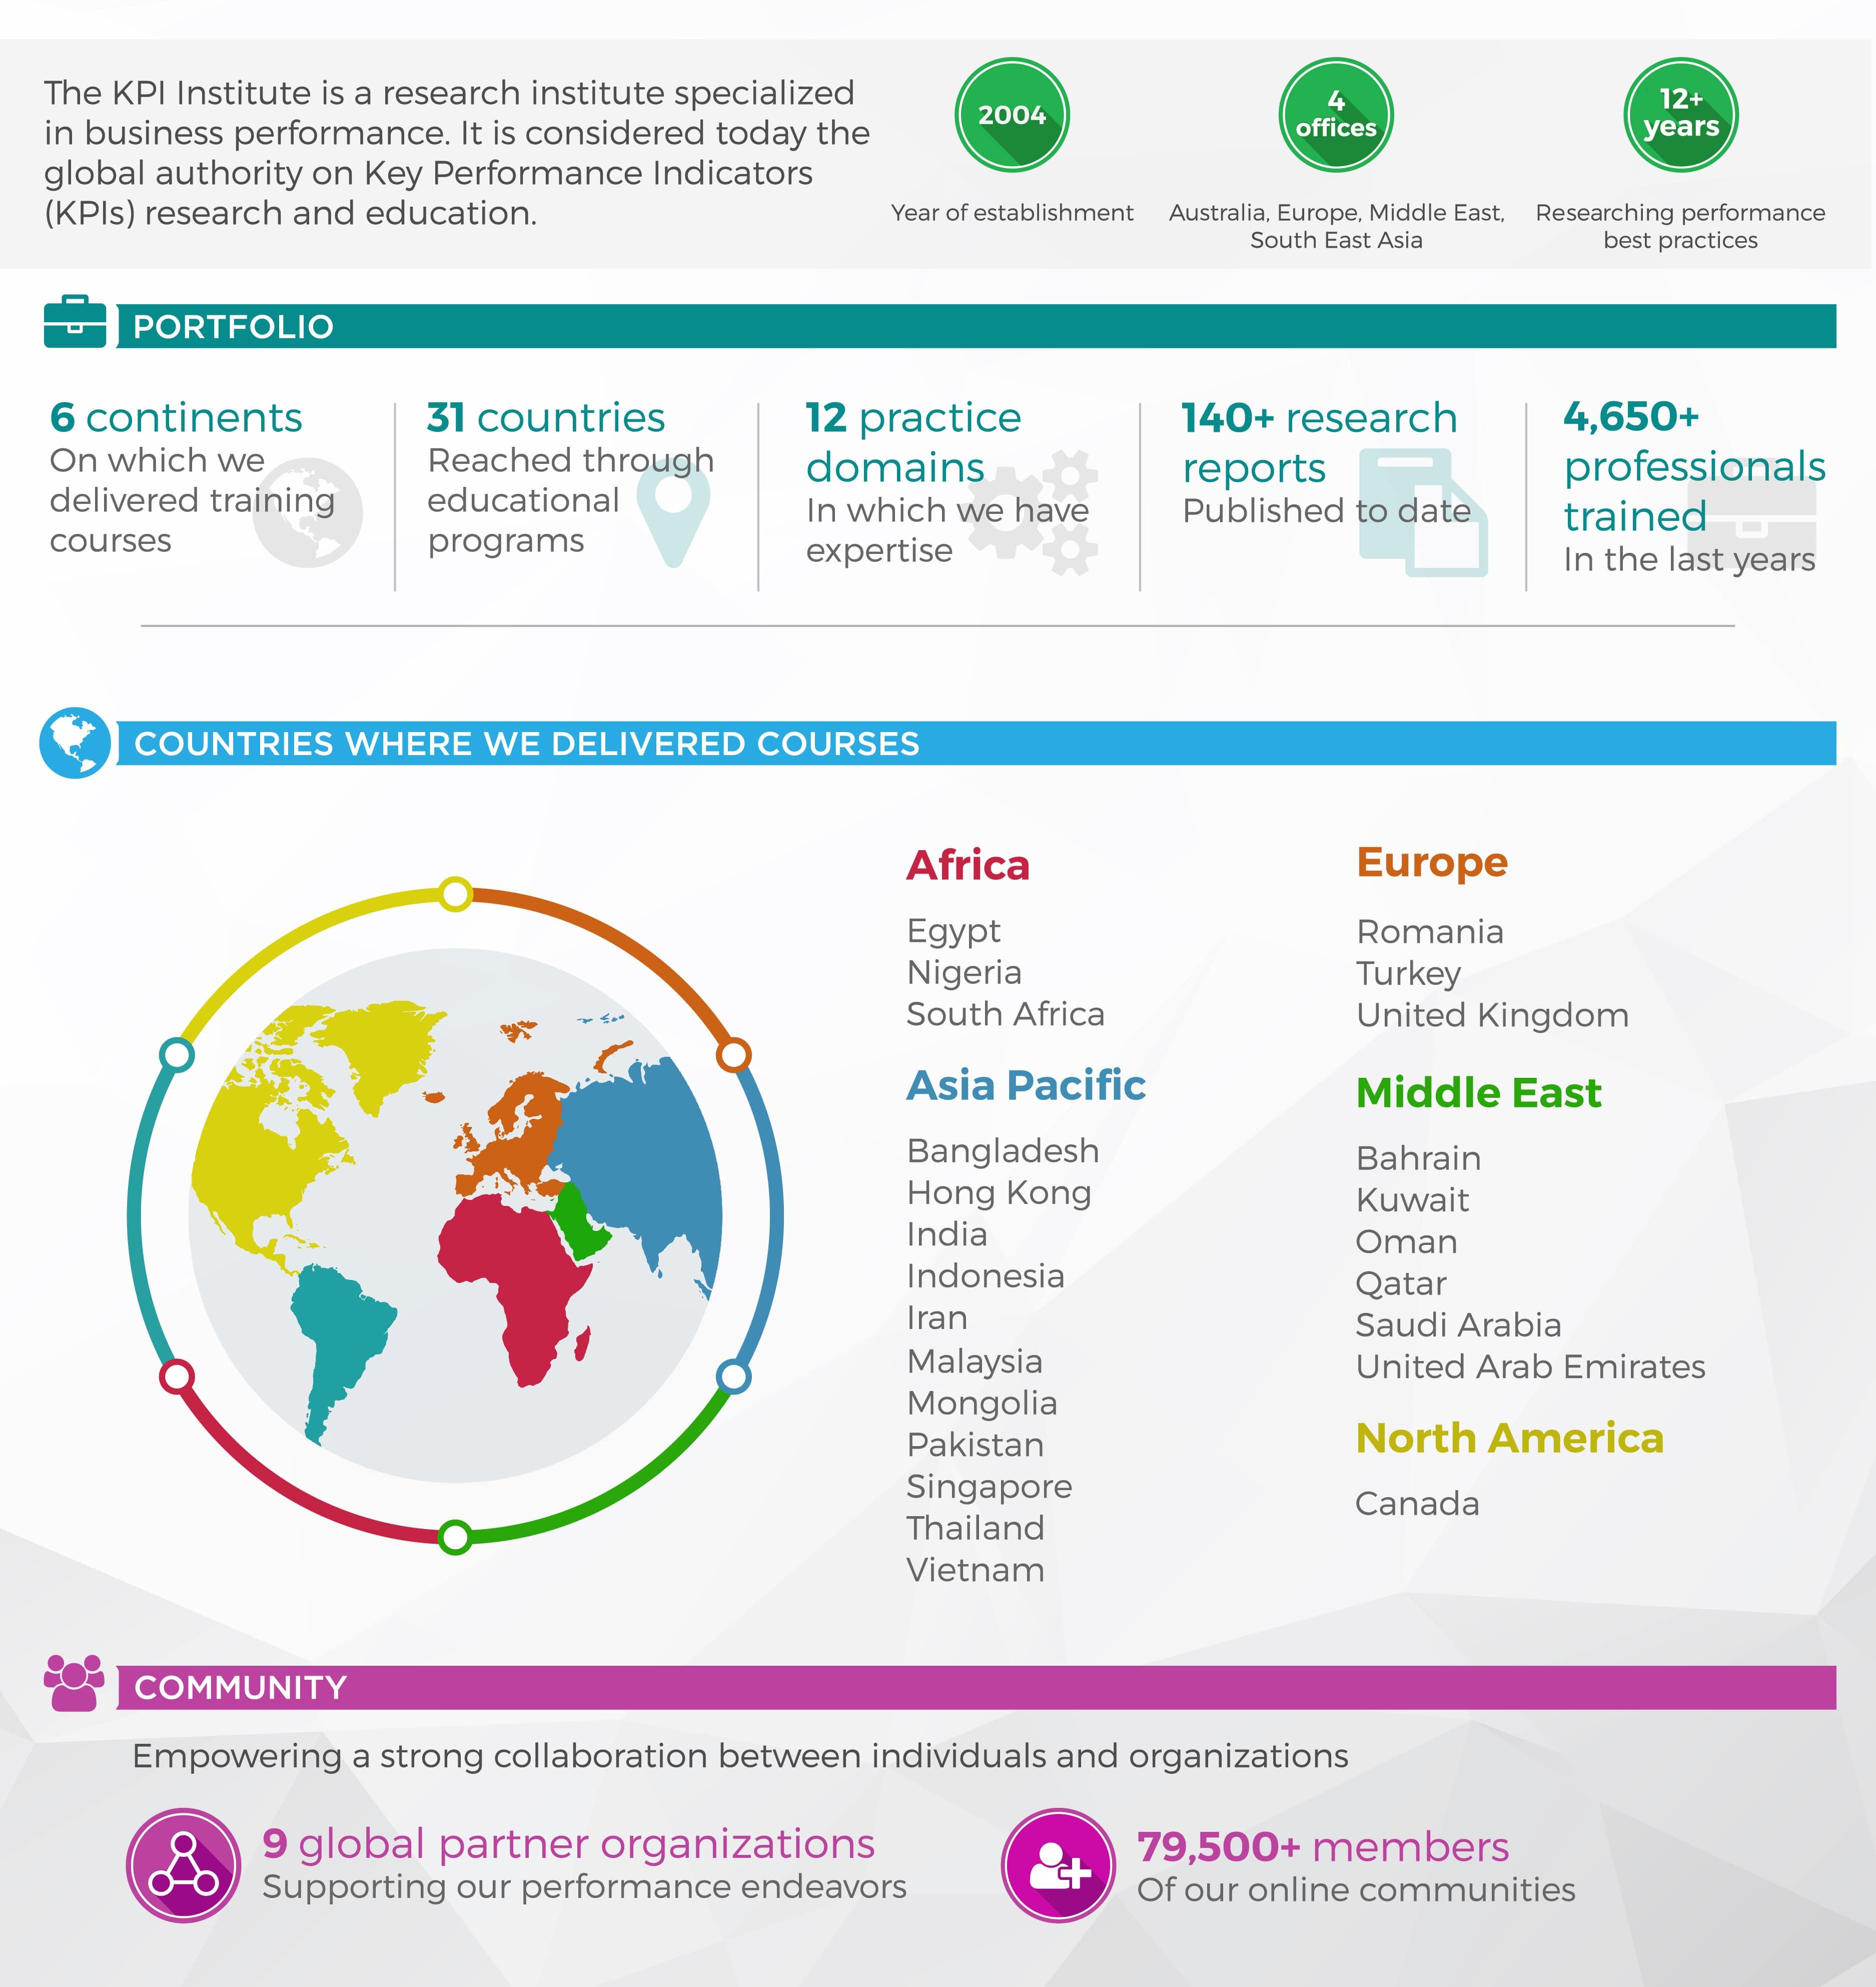 infographic-tki-04-min